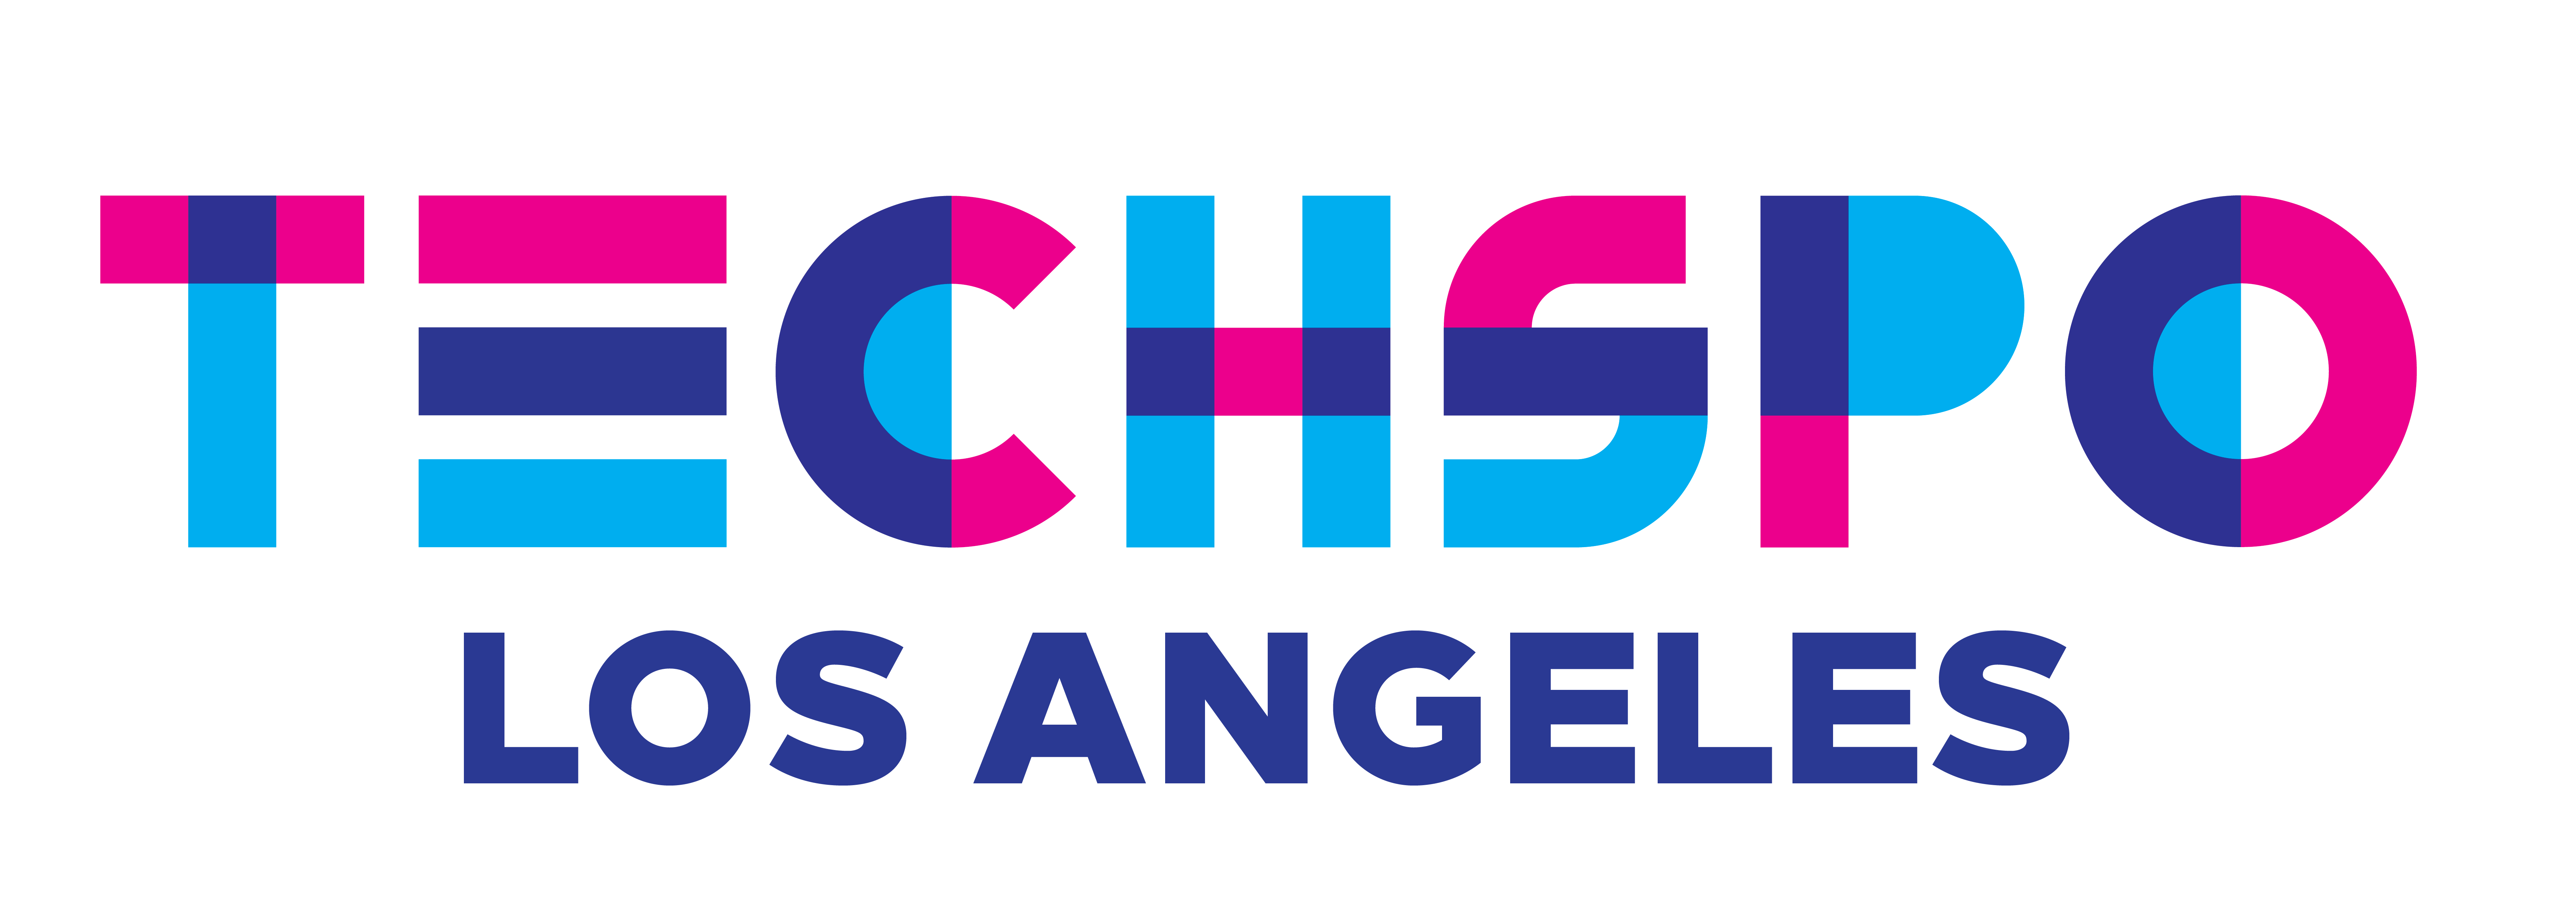 TECHSPO Los Angeles